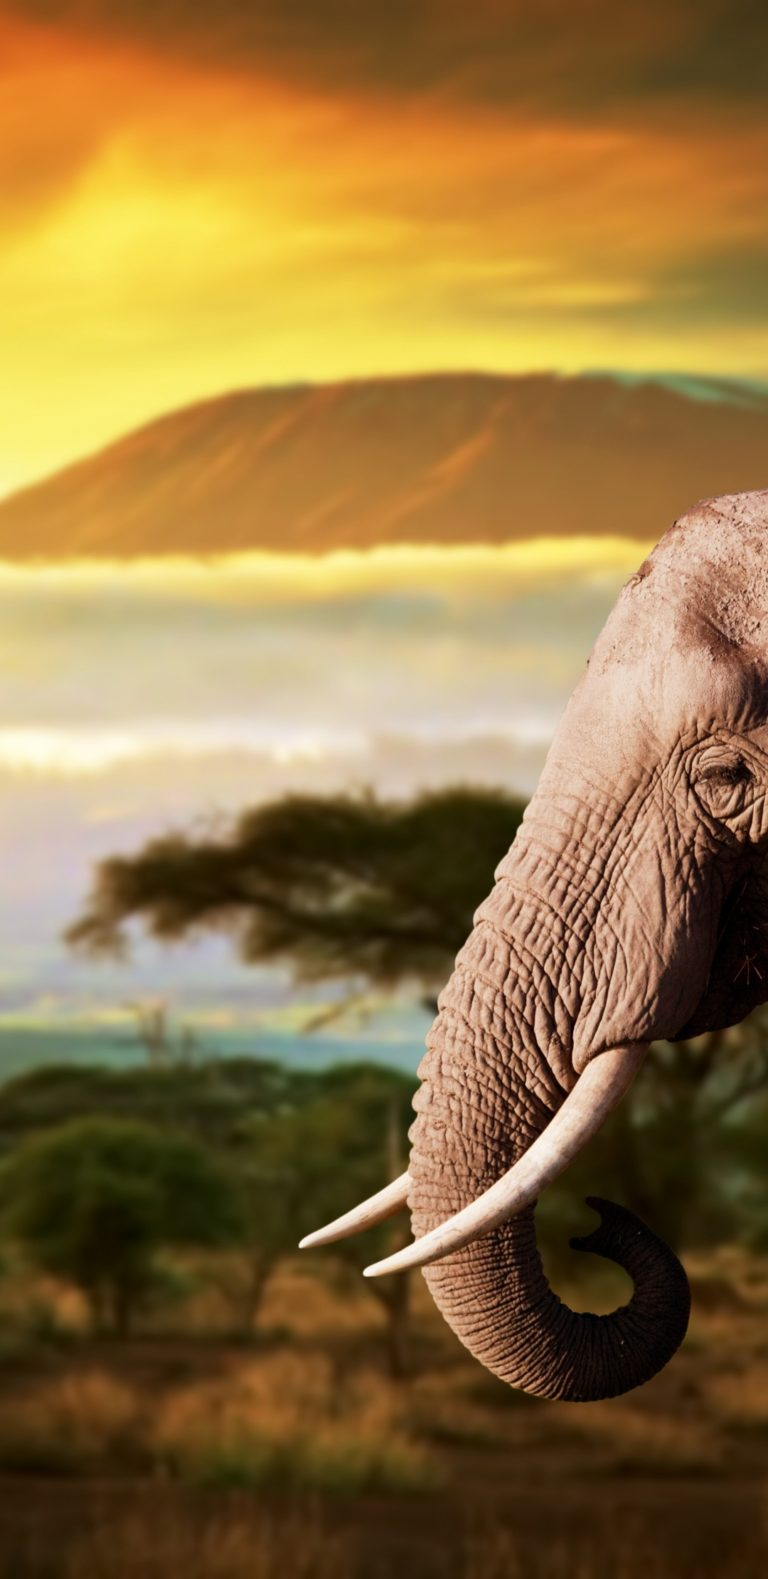 Elephant Animals 1080x2220 768x1579